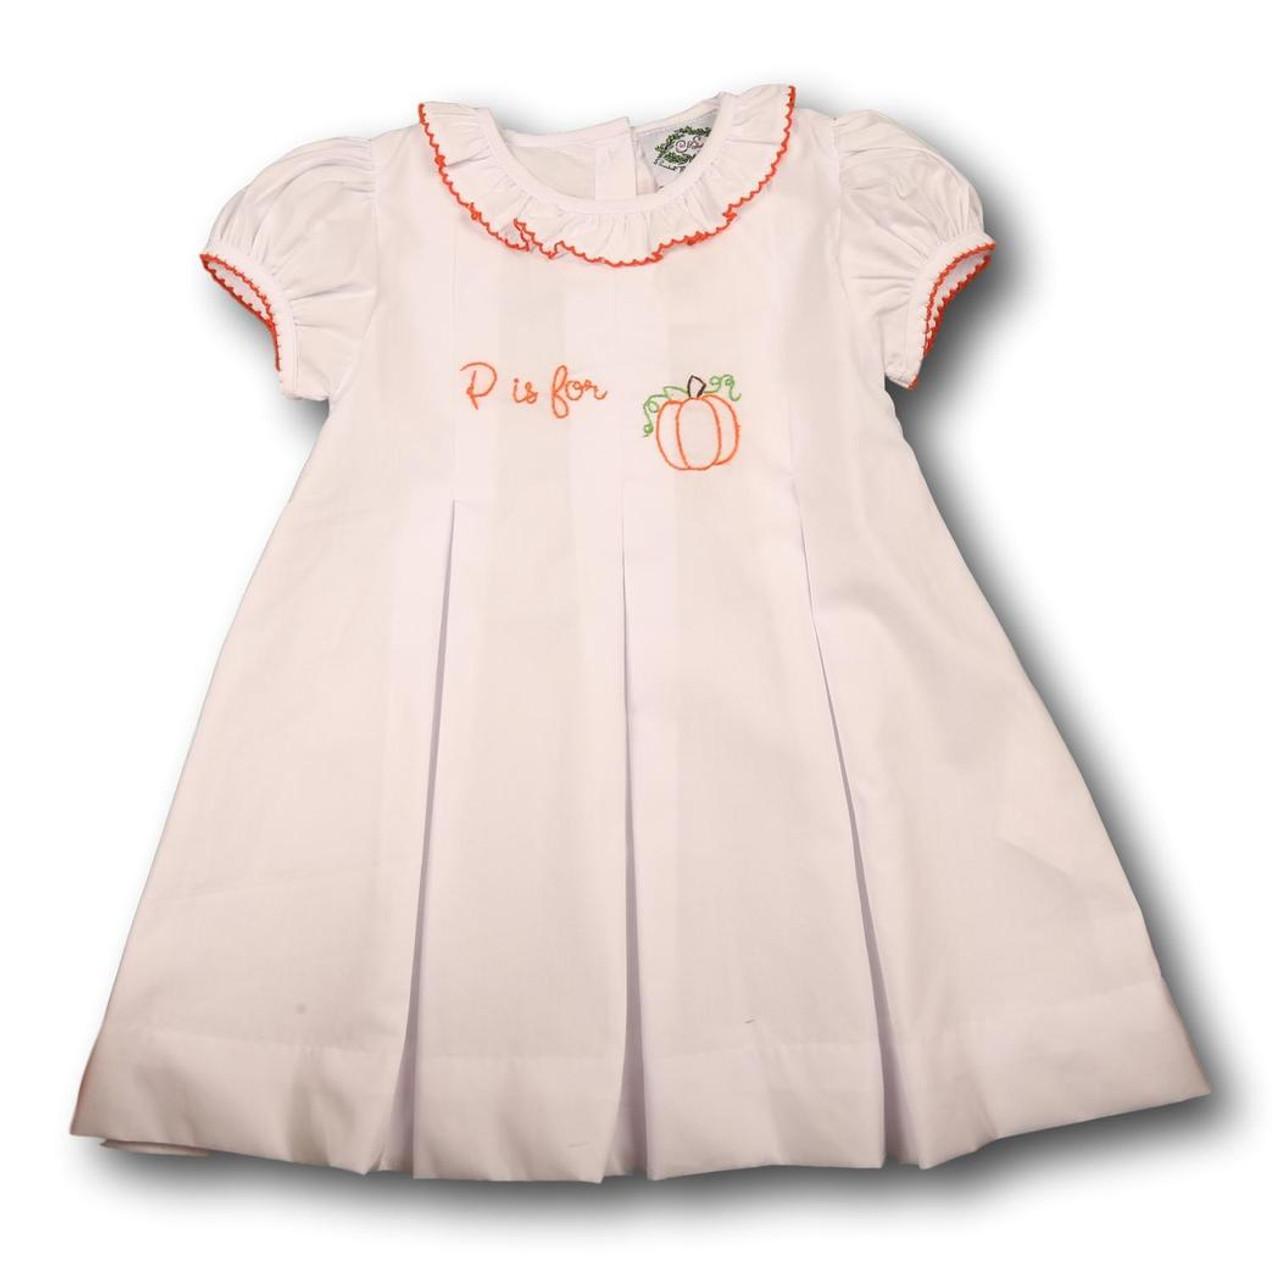 P Is For Pumpkin Dress POCL541 D114 18